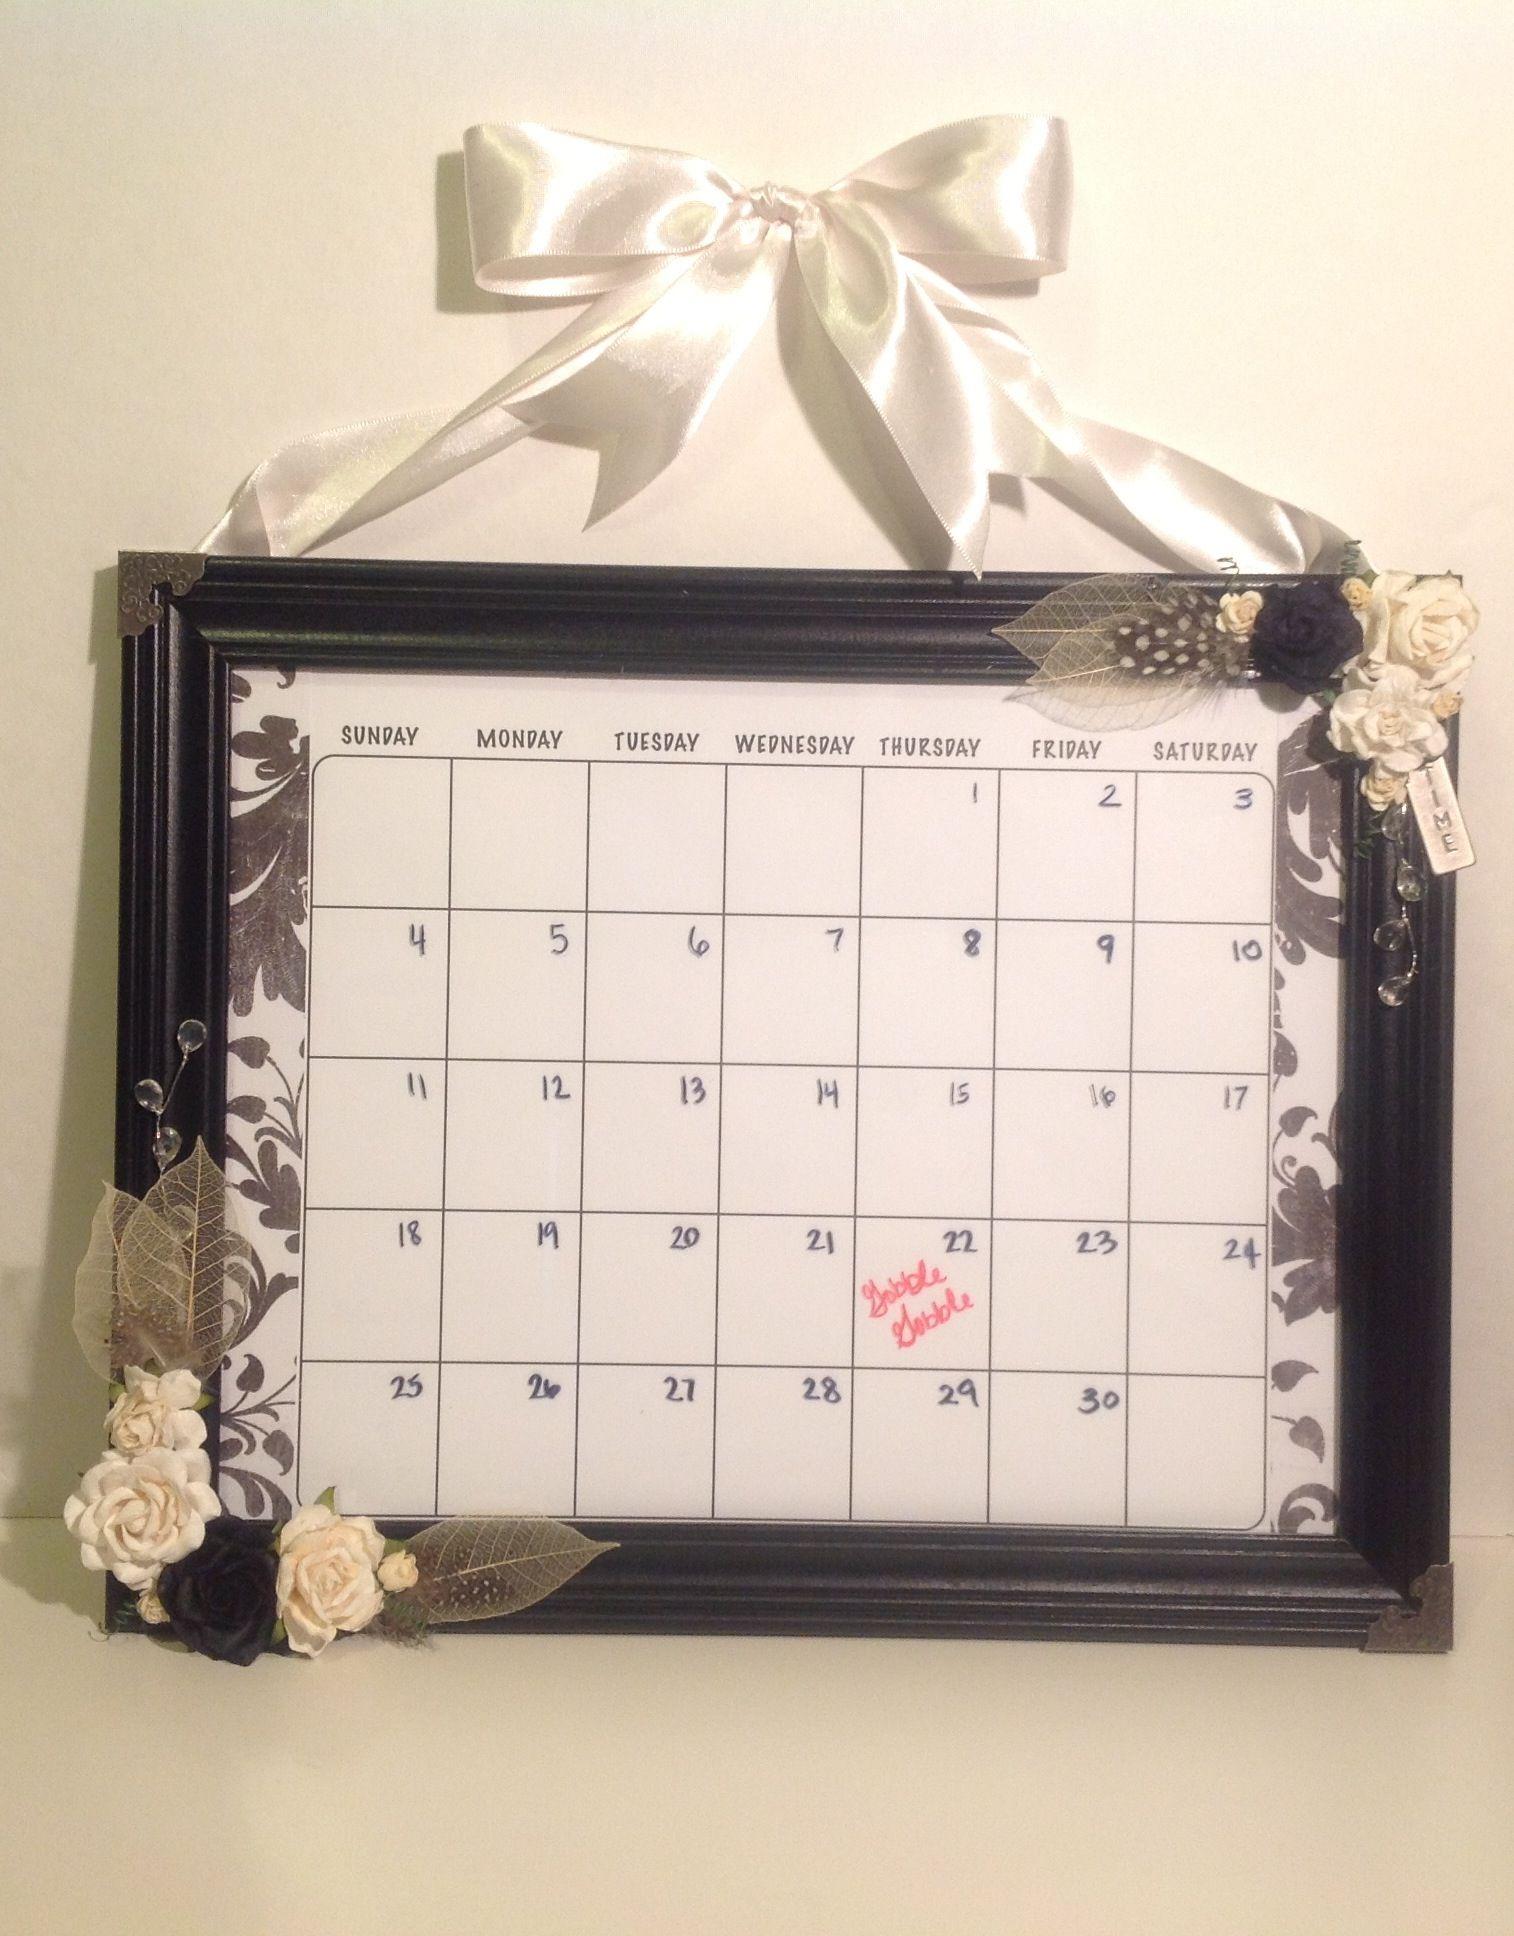 DIY Picture frame dry erase calendar 5 frame from